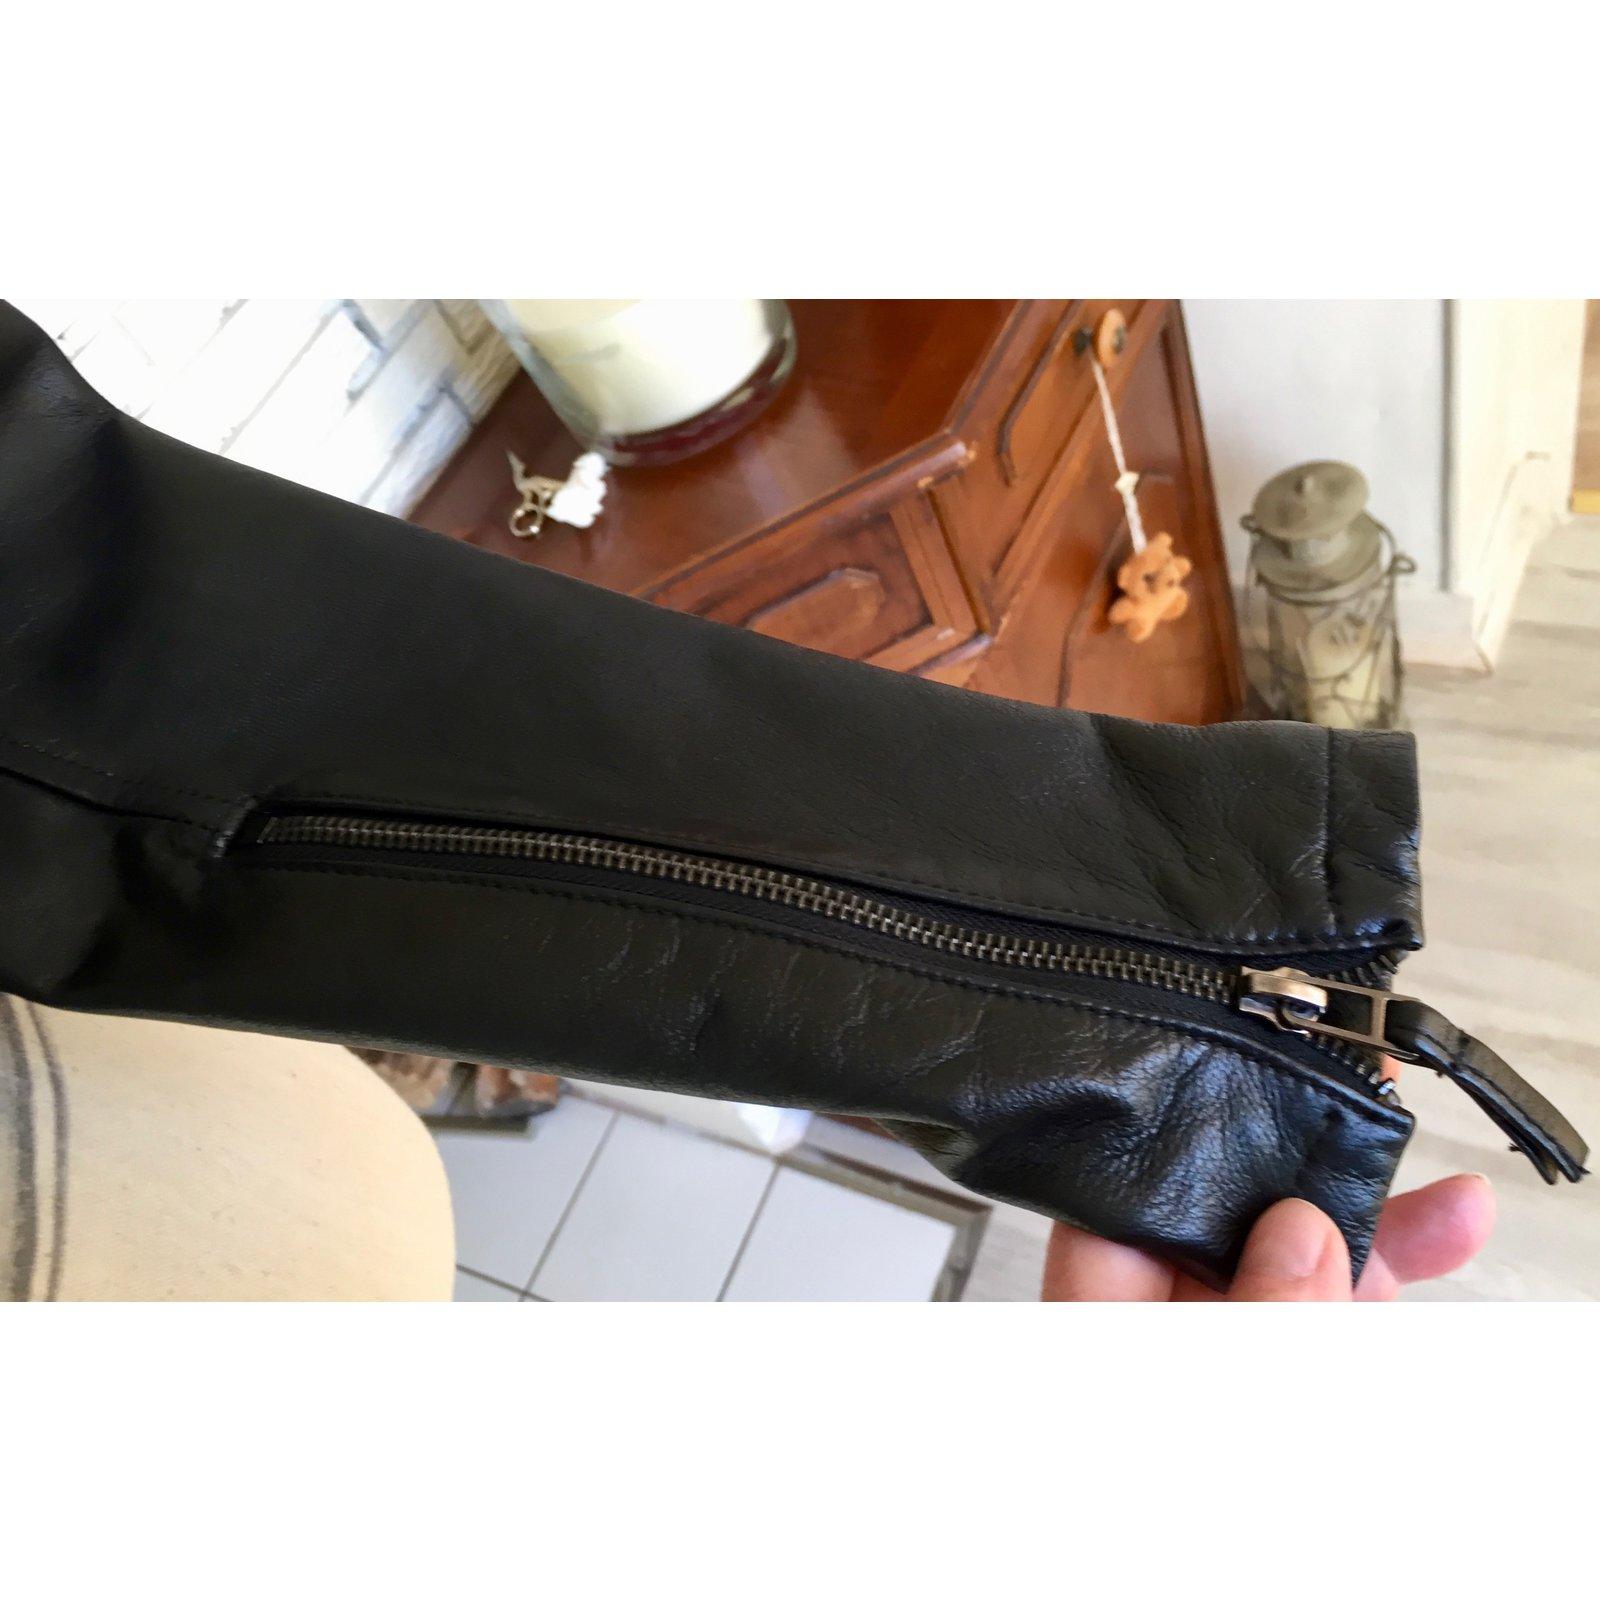 Ref Joli Autre Vestes 51638 Marque Noir Zara Cuir Closet Veste gqZxR6A